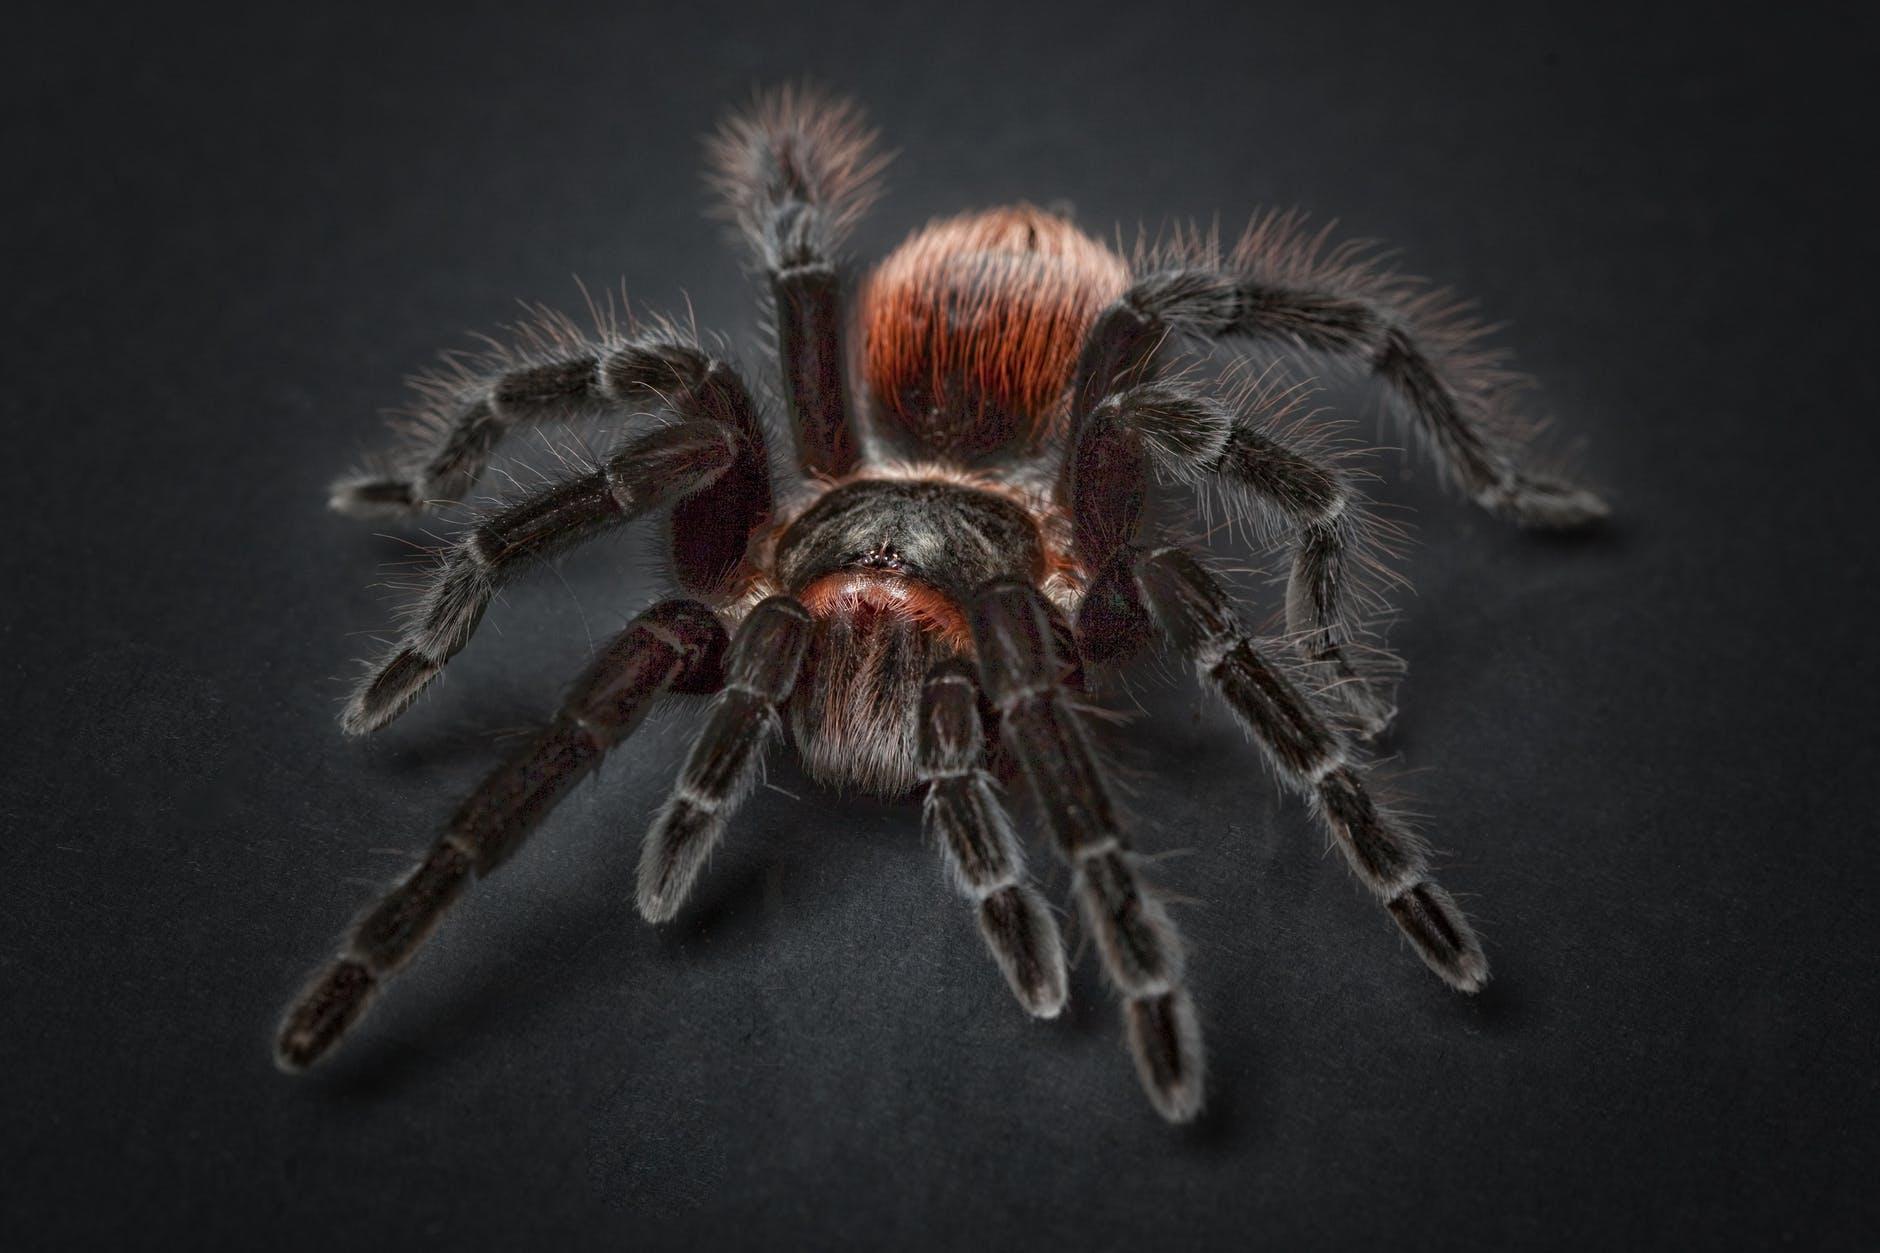 animal arachnid close up eerie